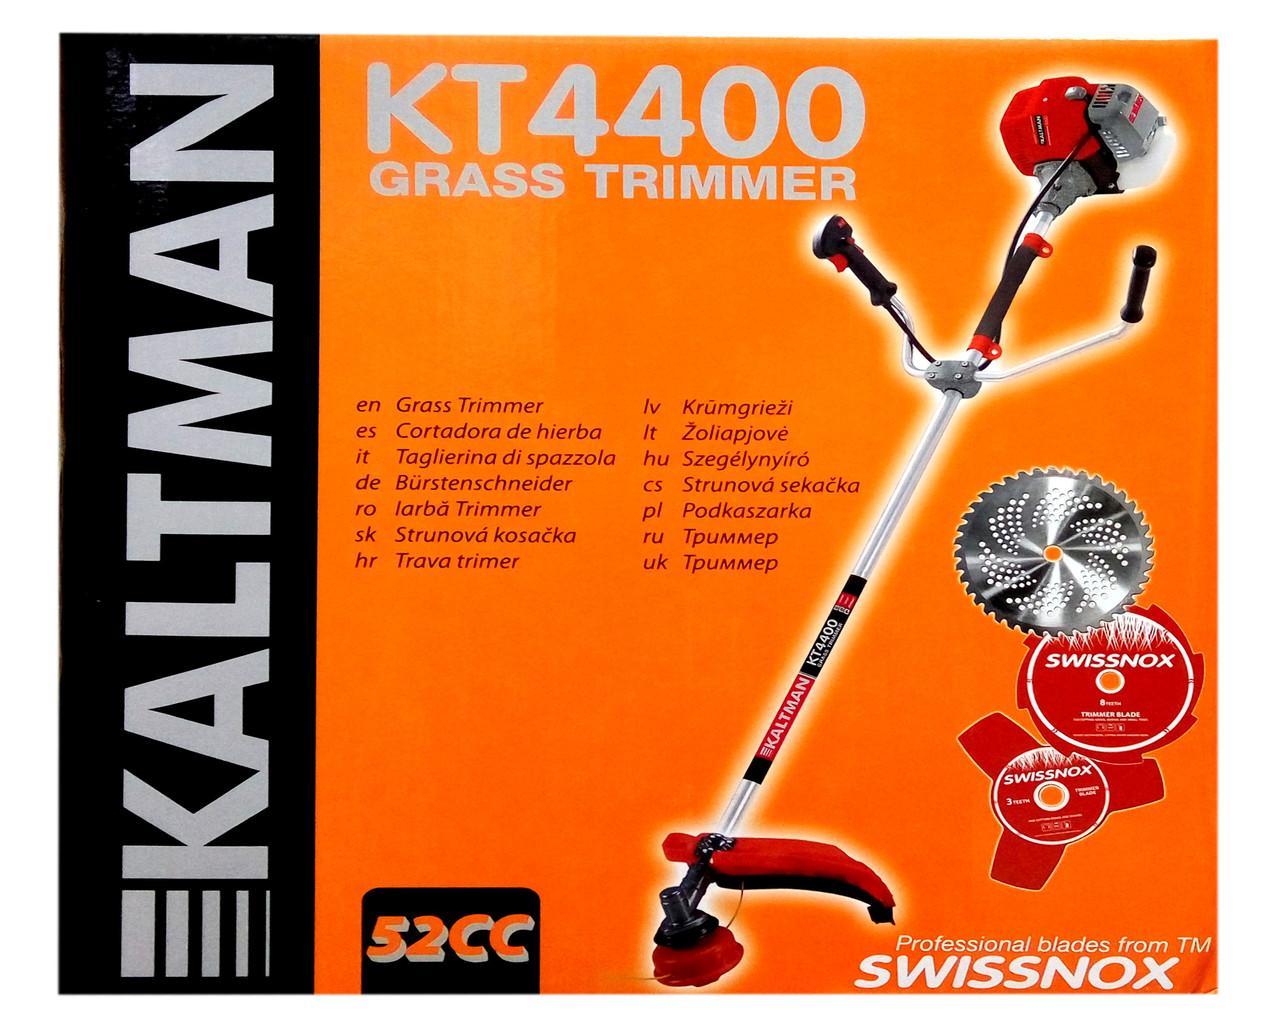 Мотокоса Kaltman KT 4400